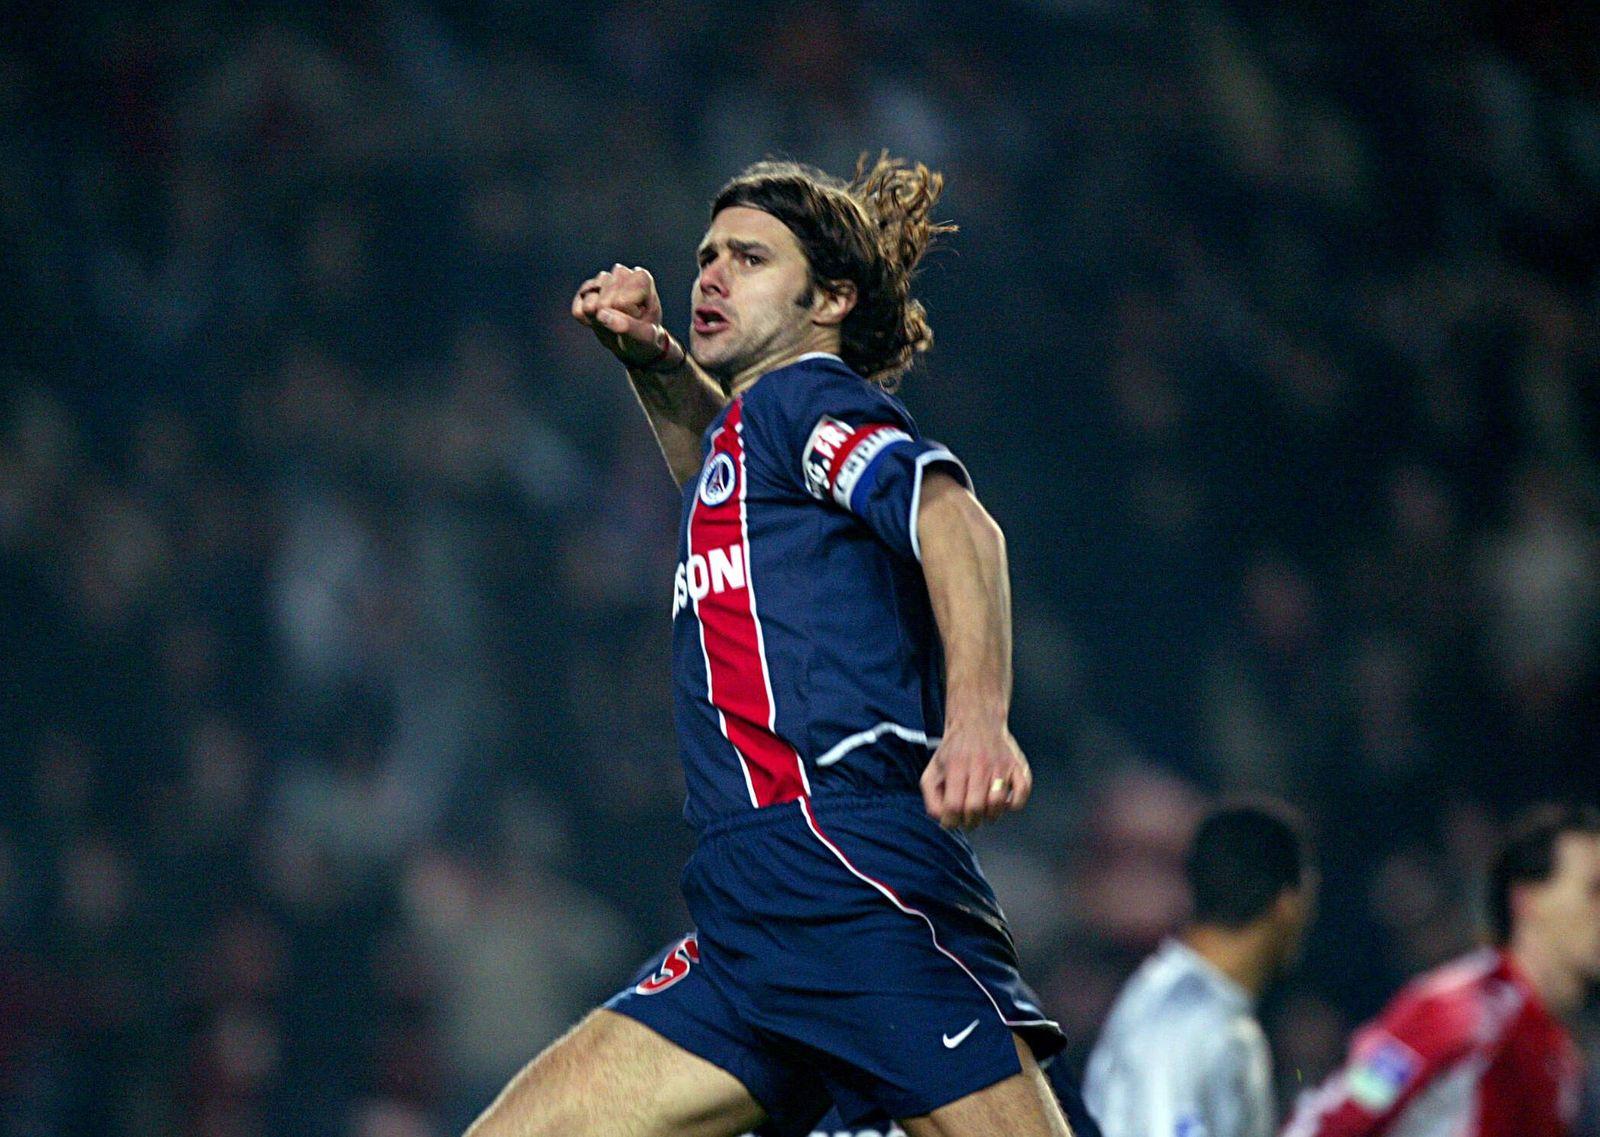 Joie de Mauricio POCHETTINO apres son but - Paris St Germain /Lille - 29.01.2003 - L1 - Foot Football - PSG - joie larg